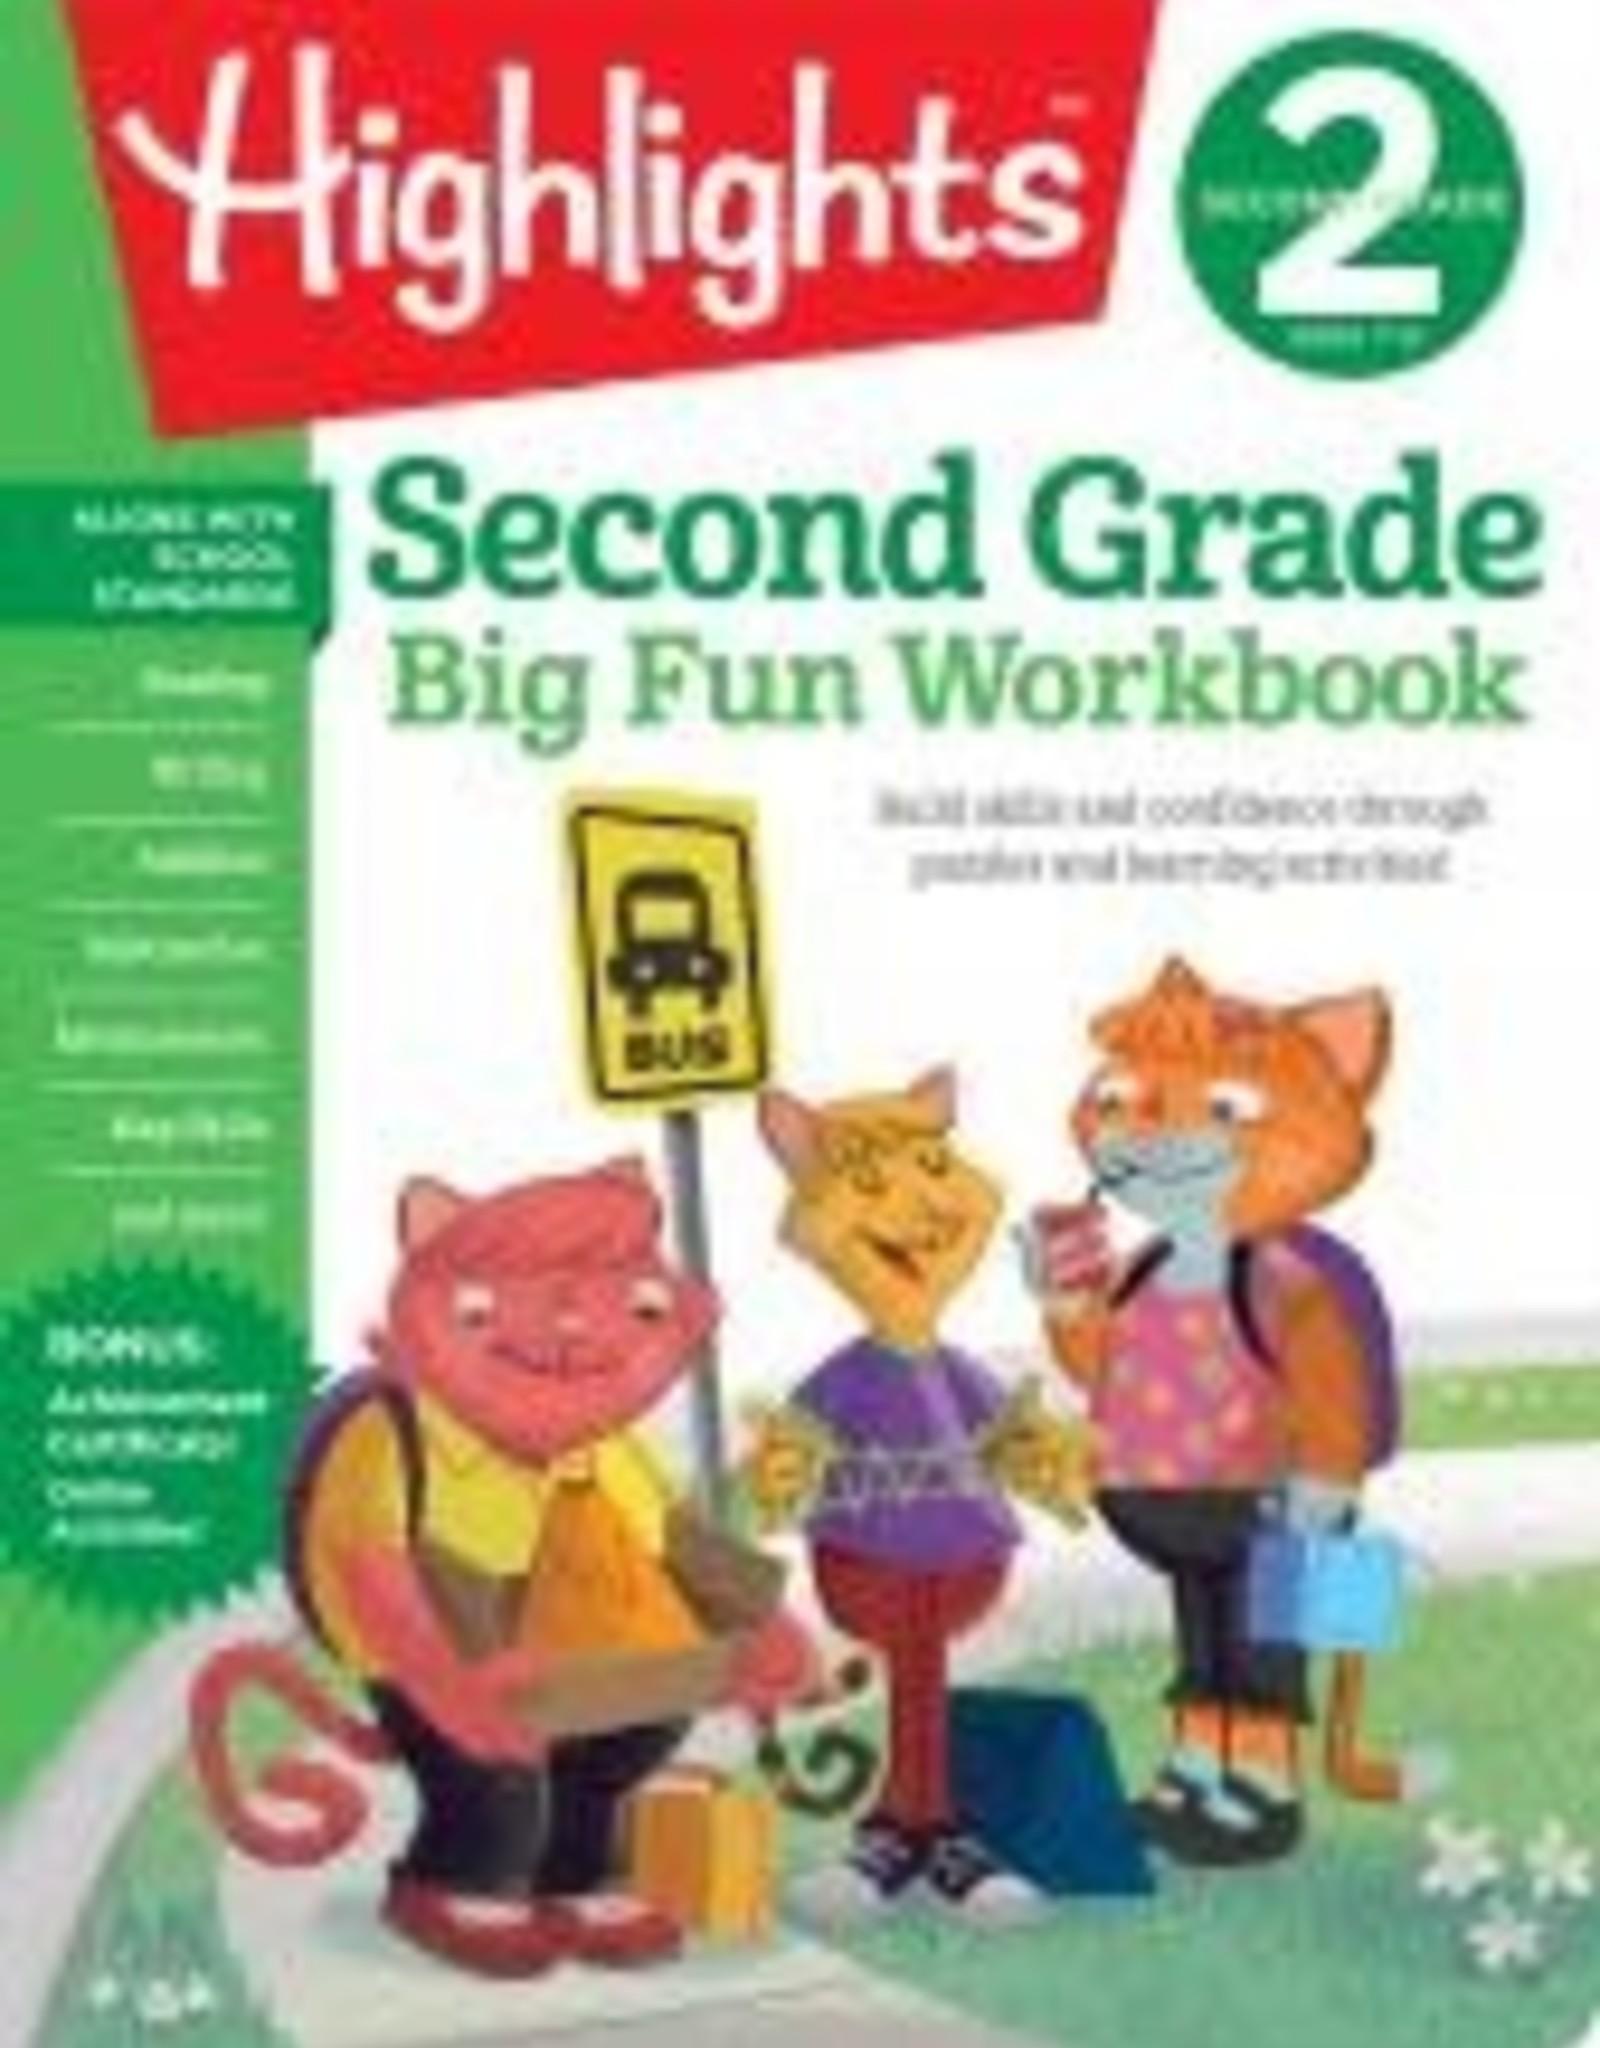 Random House/Penguin Highlights: Second Grade Workbook